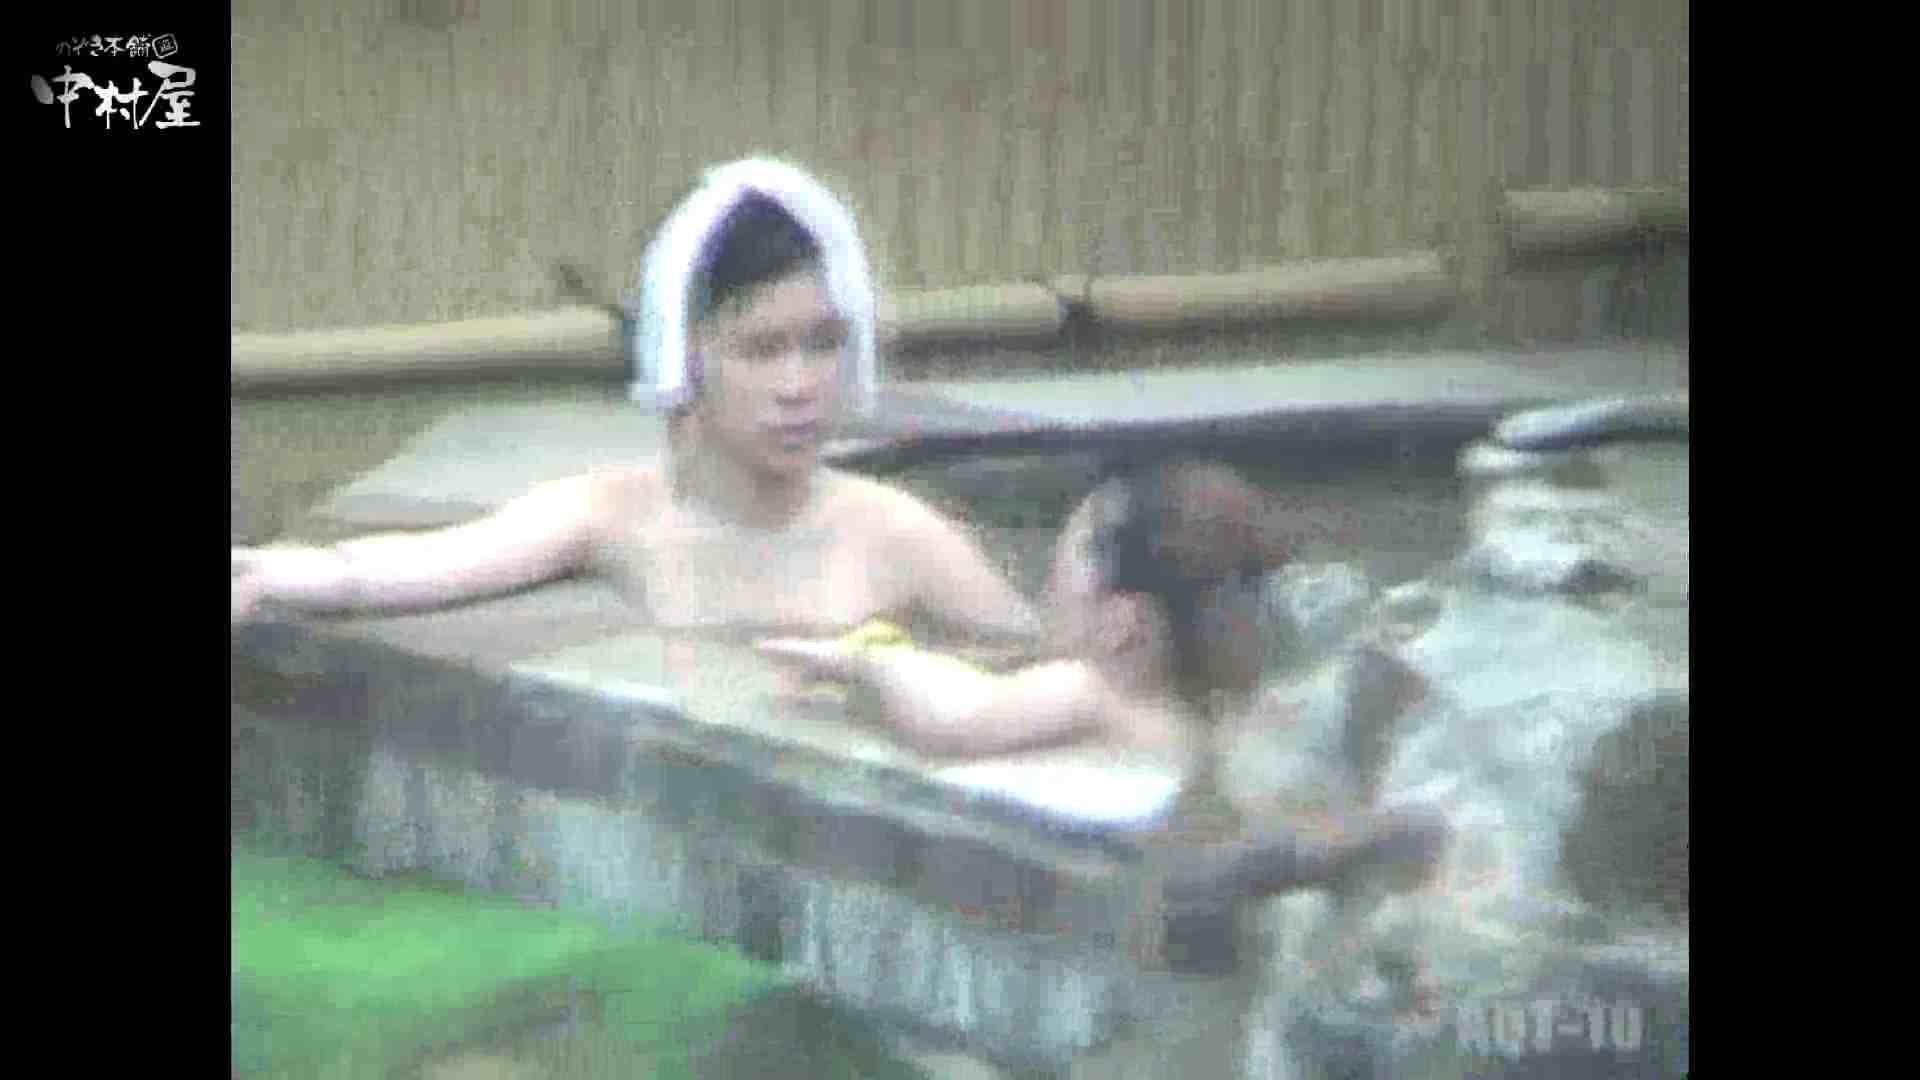 Aquaな露天風呂Vol.874潜入盗撮露天風呂十判湯 其の三 潜入突撃  77pic 68